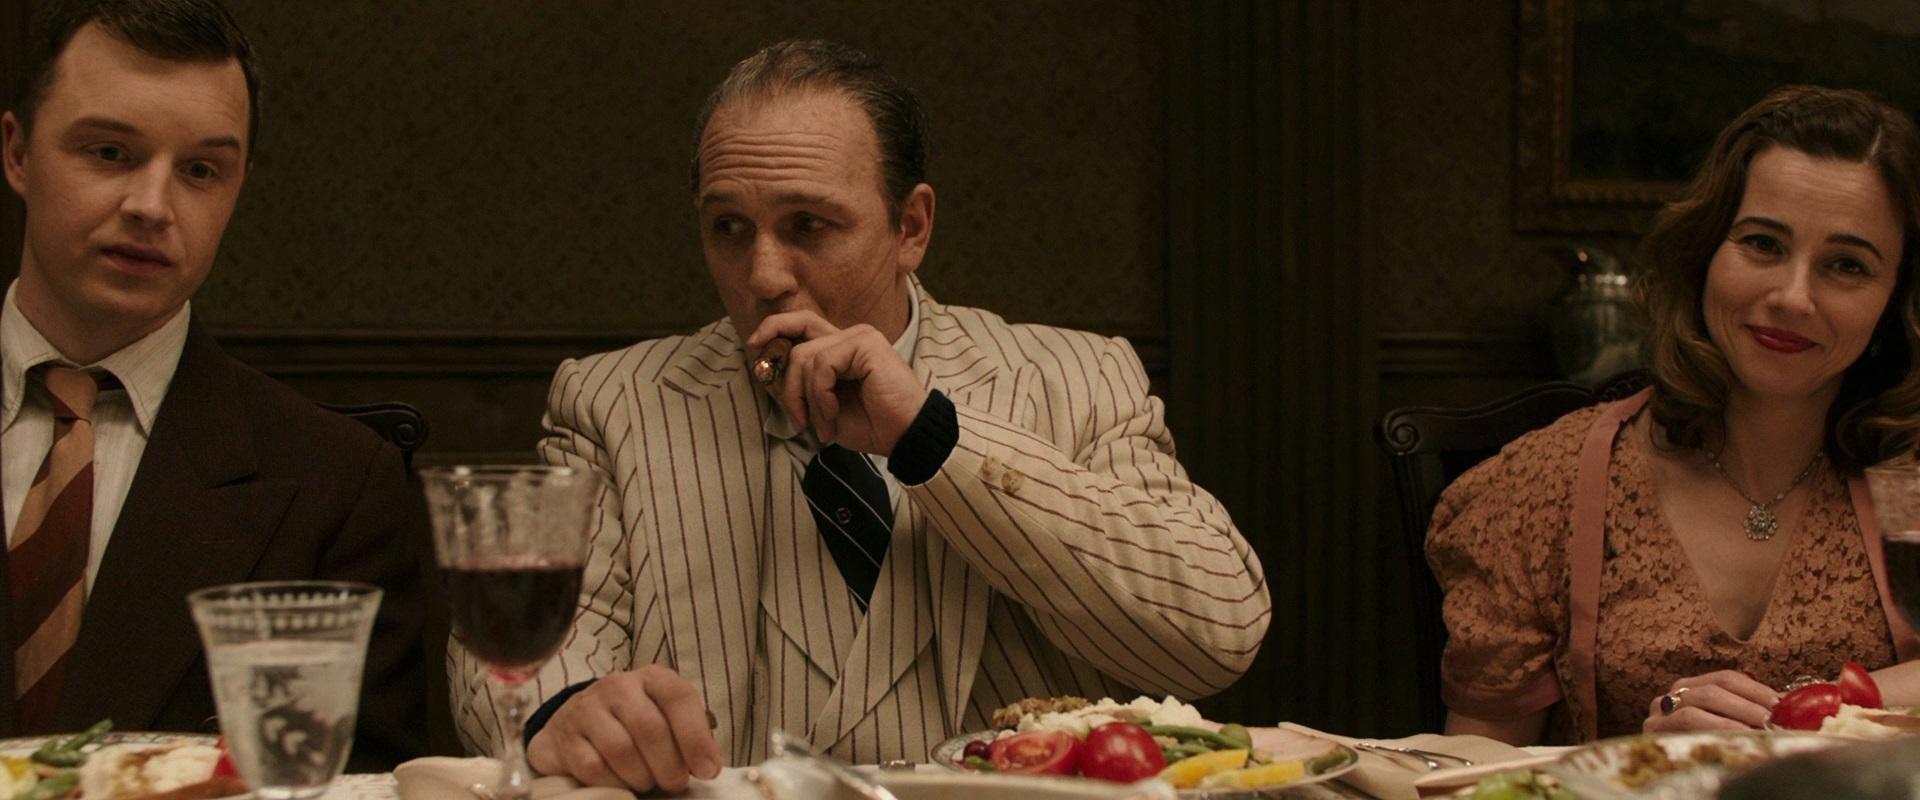 Capone | 2020 | WEB-DL | XviD | Türkçe Dublaj | m720p - m1080p | WEB-DL | Tek Link